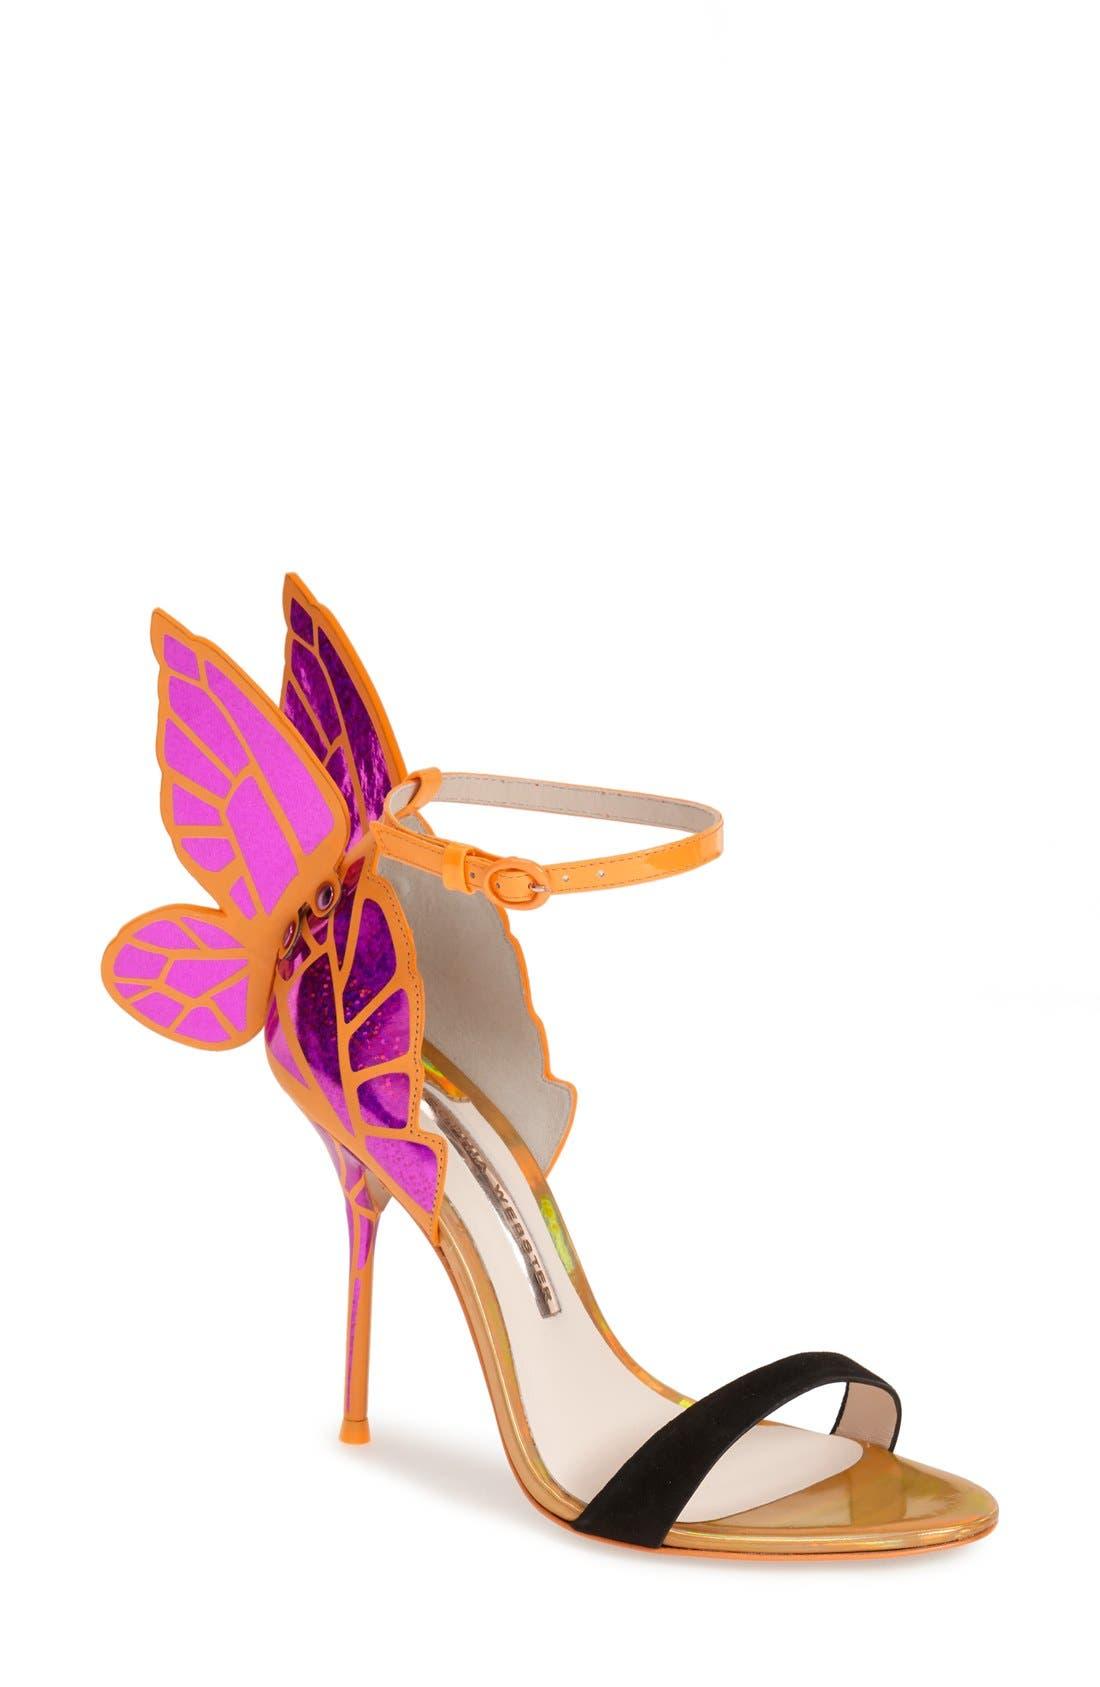 Main Image - Sophia Webster 'Chiara' Ankle Strap Sandal (Women)